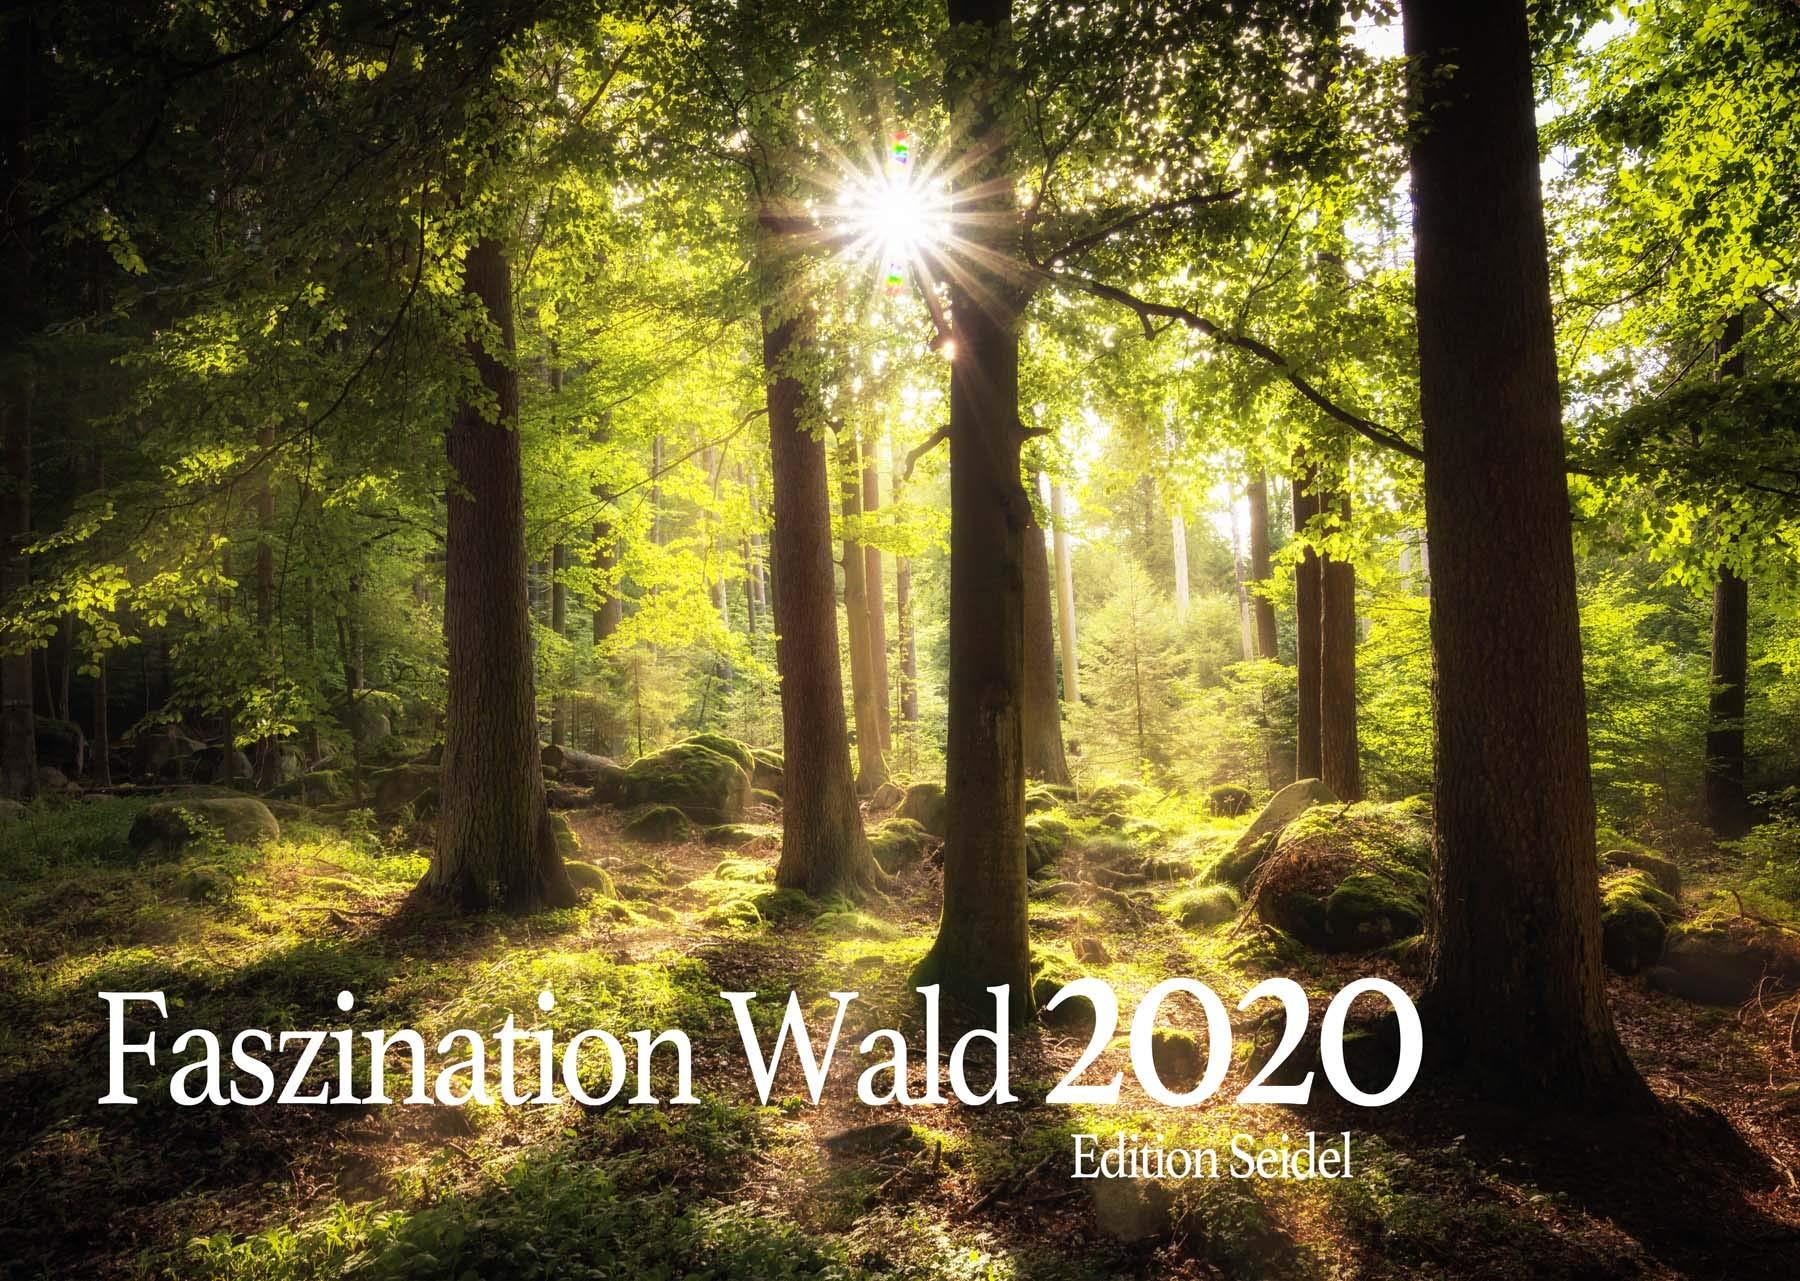 Edition Seidel Faszination Wald Premium Kalender 2020 DIN A3 Wandkalender Natur